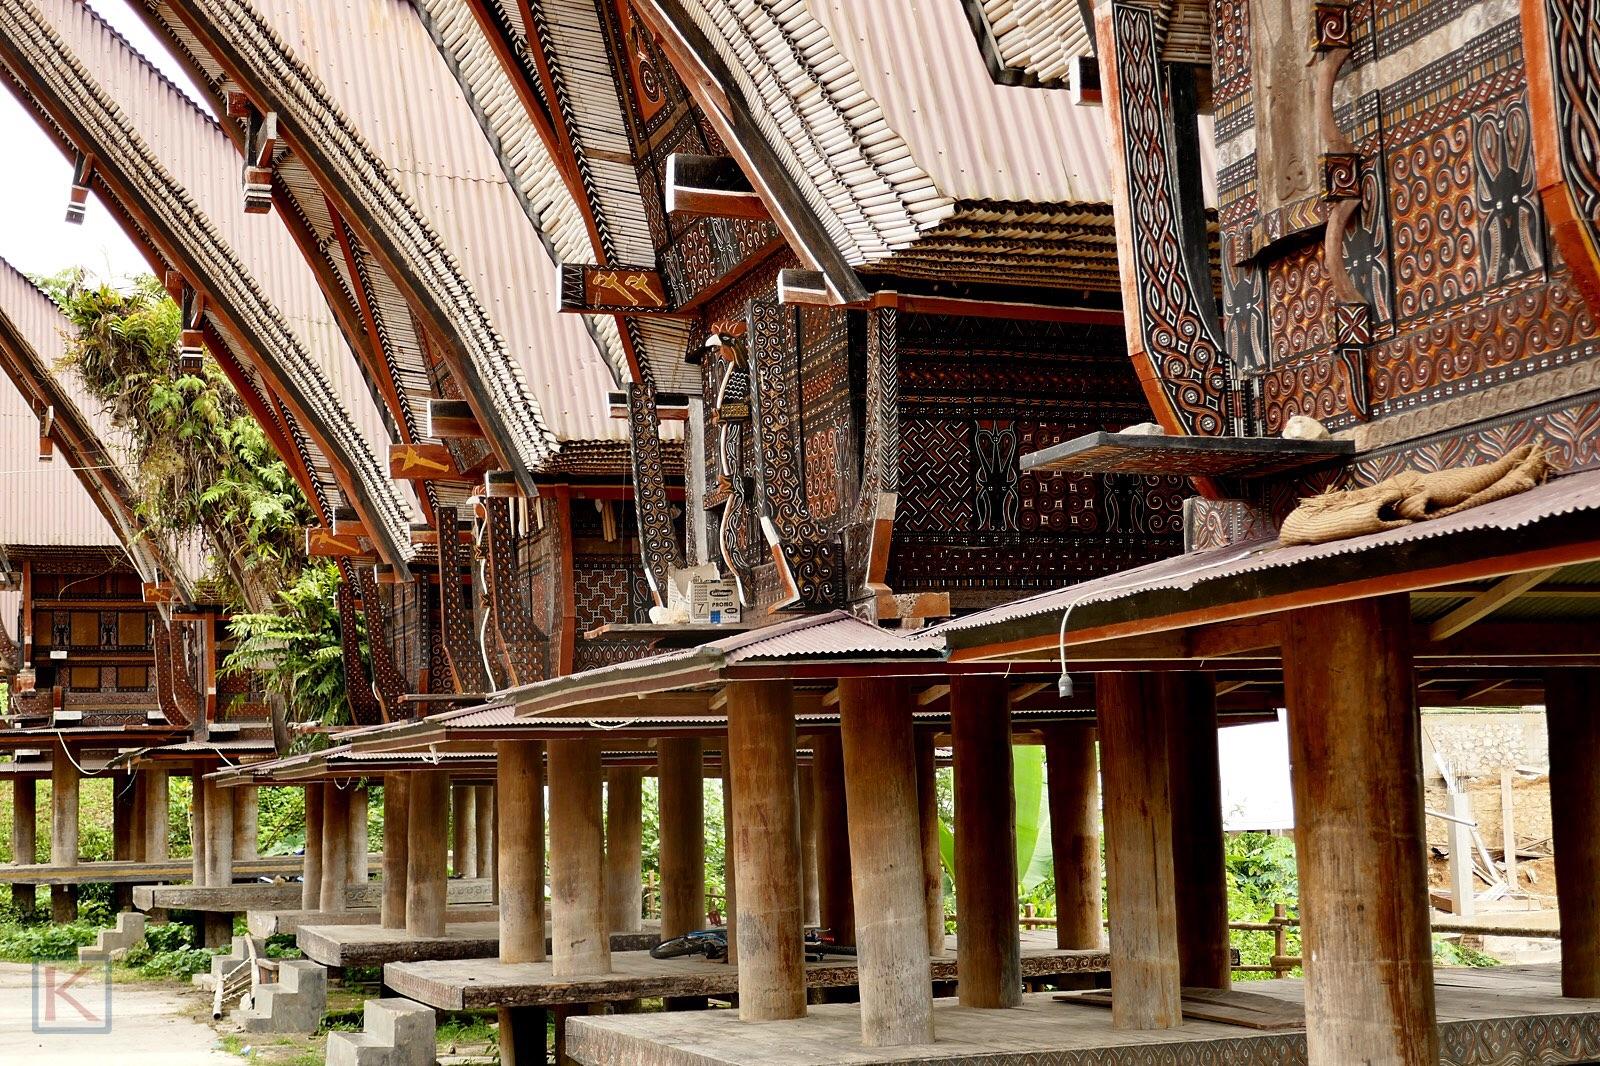 Sulawesi en de dodenverering in Toraja